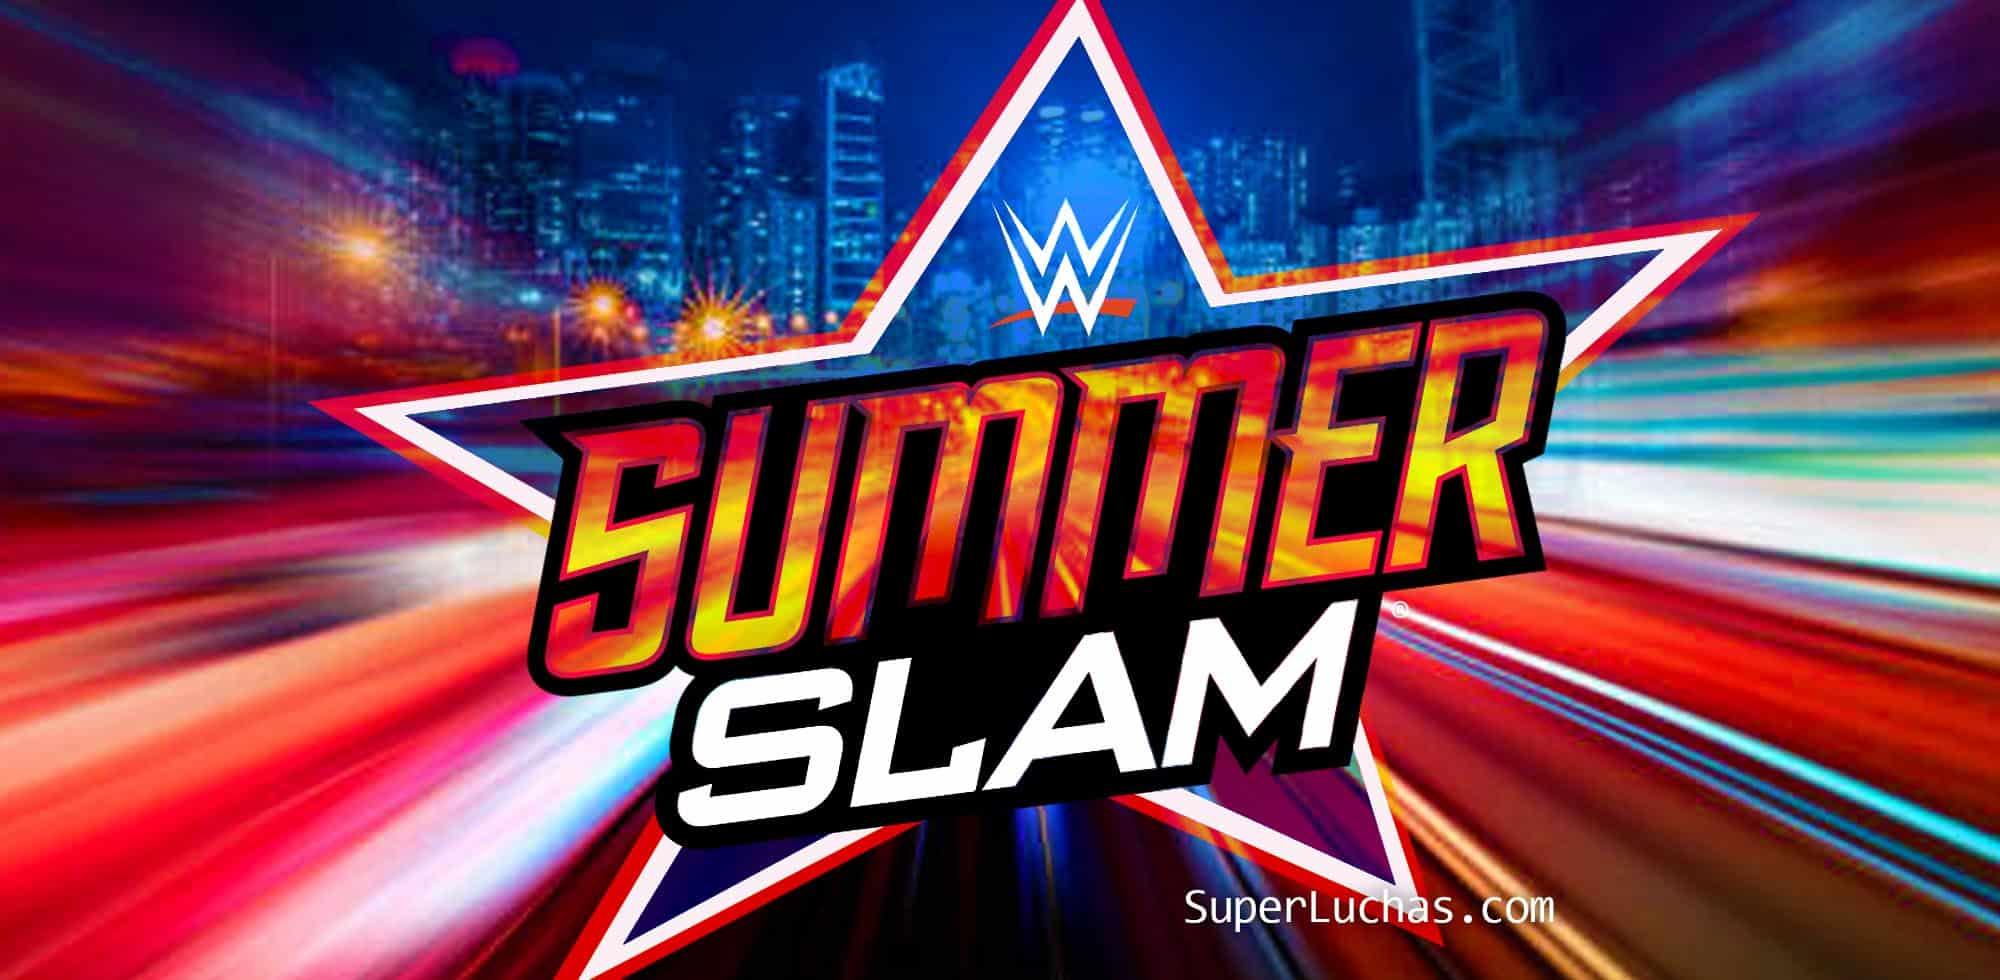 SummerSlam logo WWE SummerSlam 2020